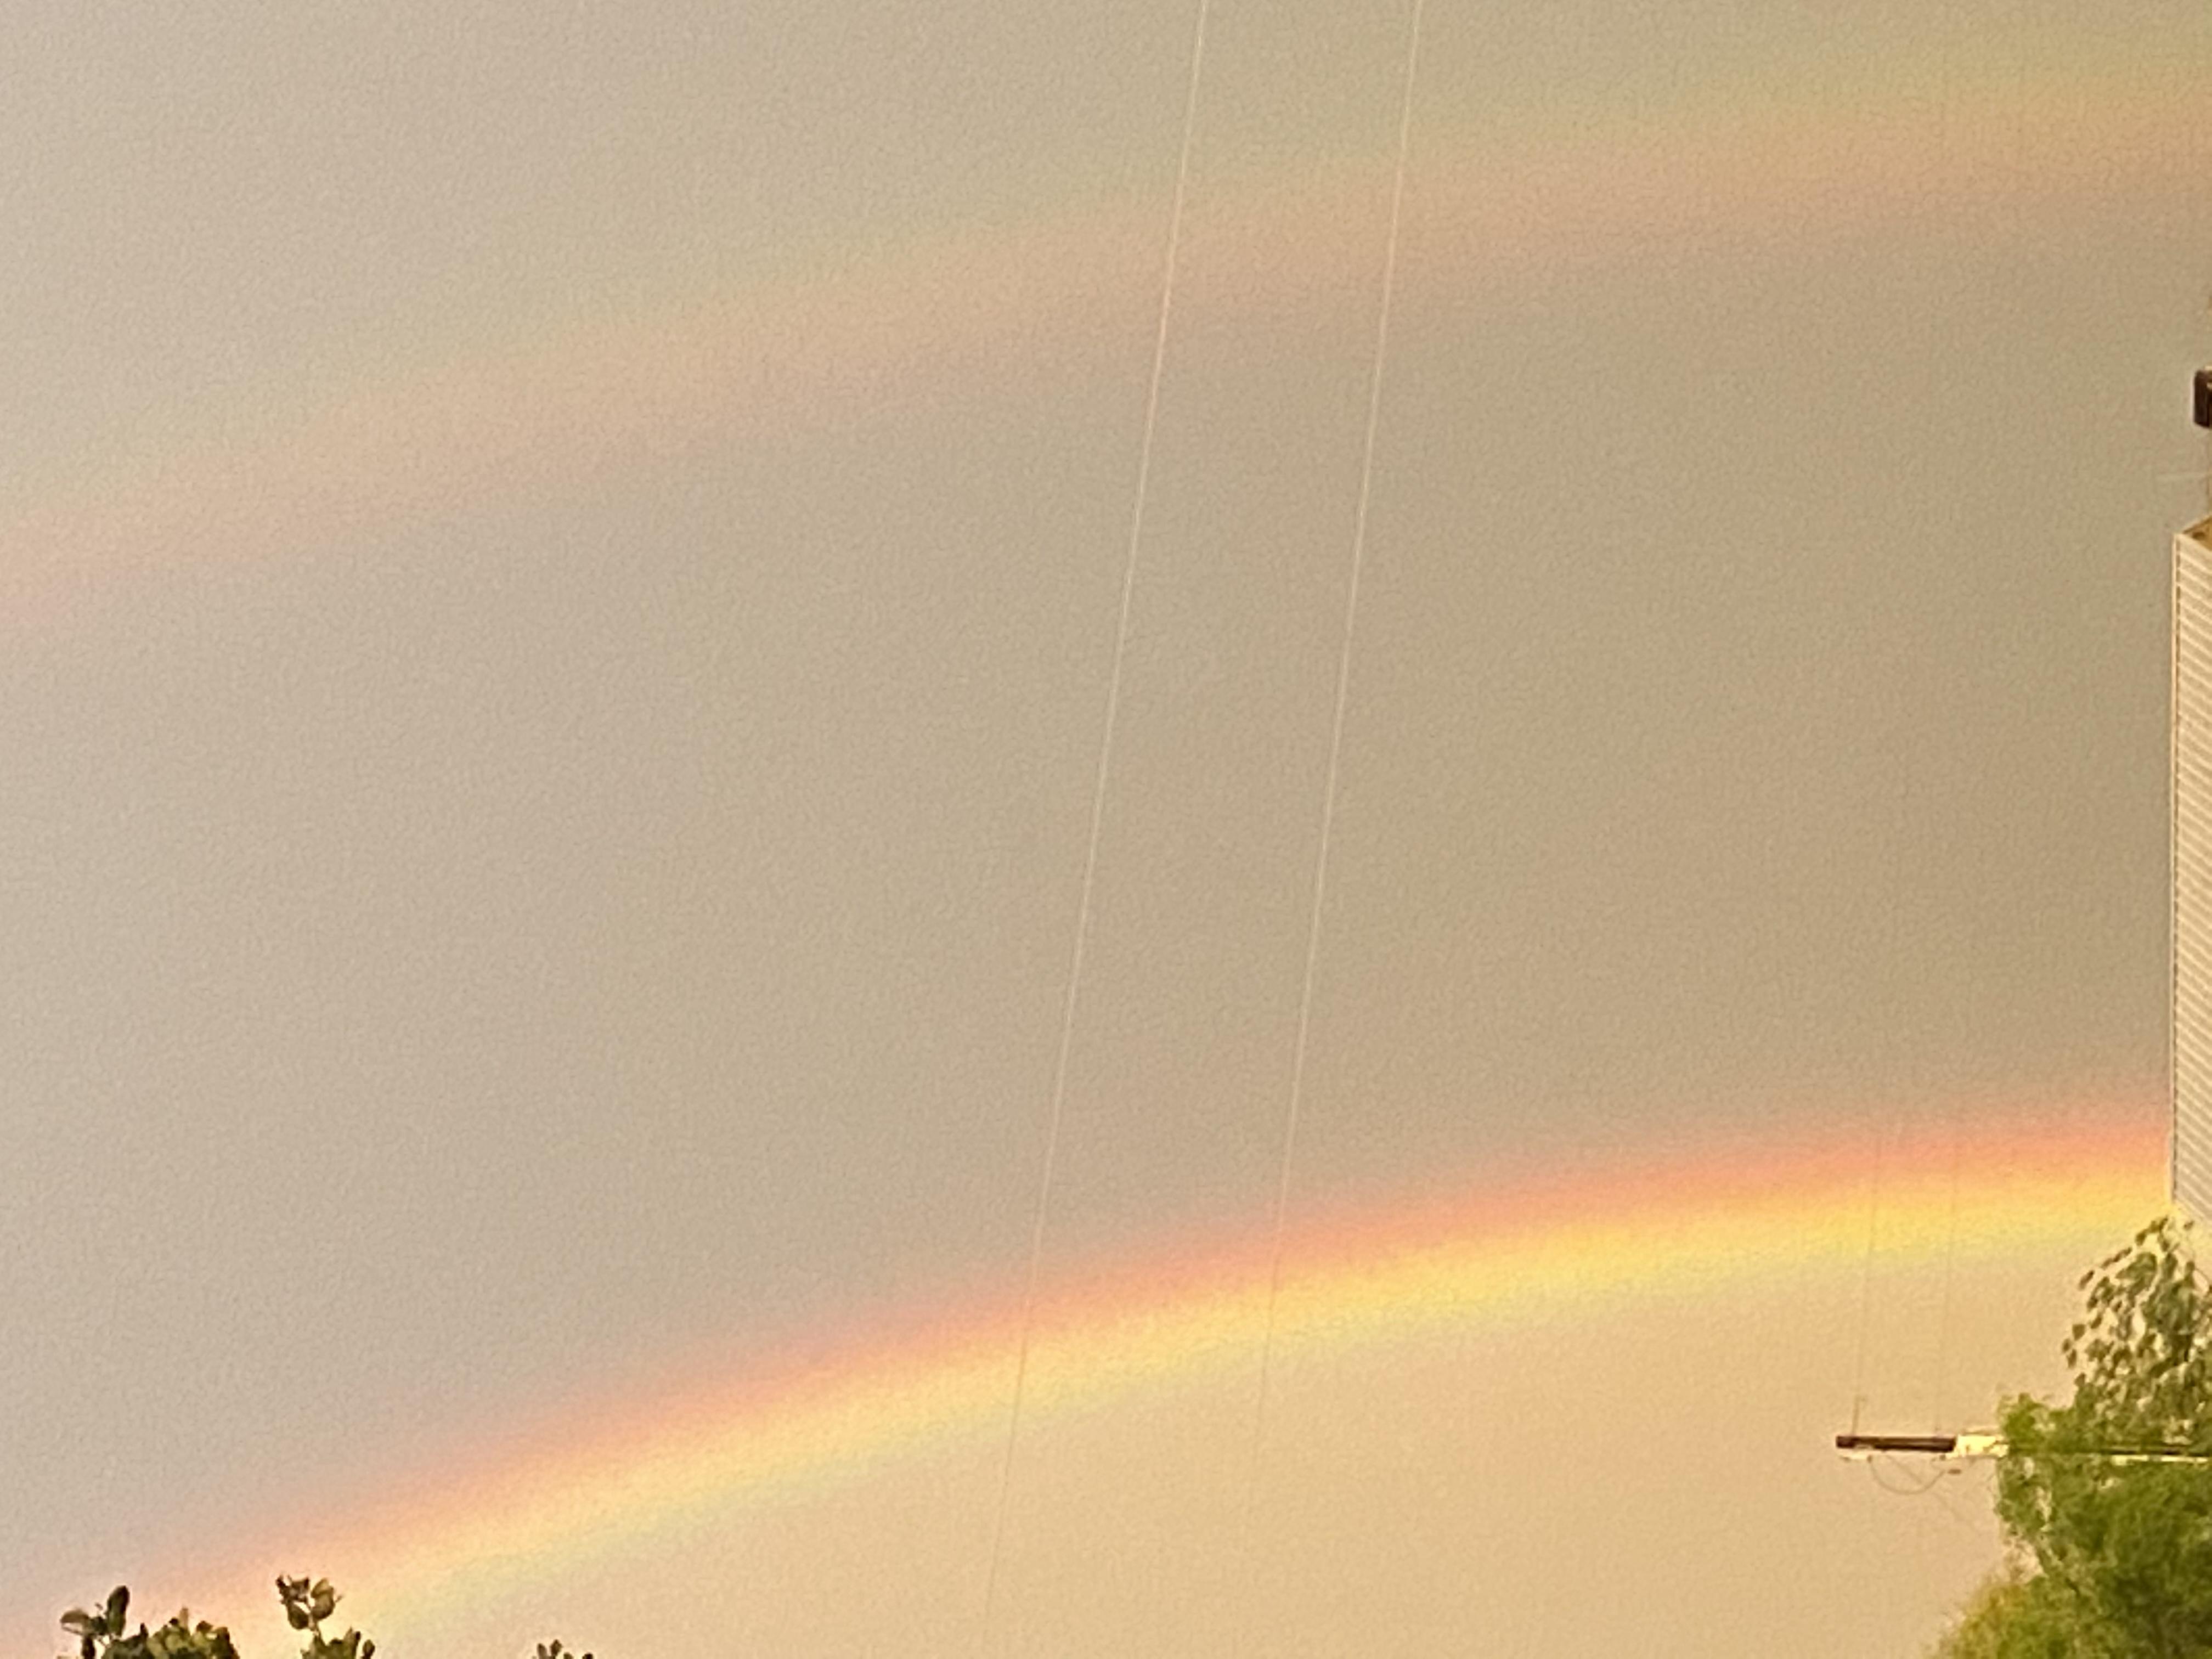 Rainbow in Winchester, Texas (Courtesy of Karen Robbins)